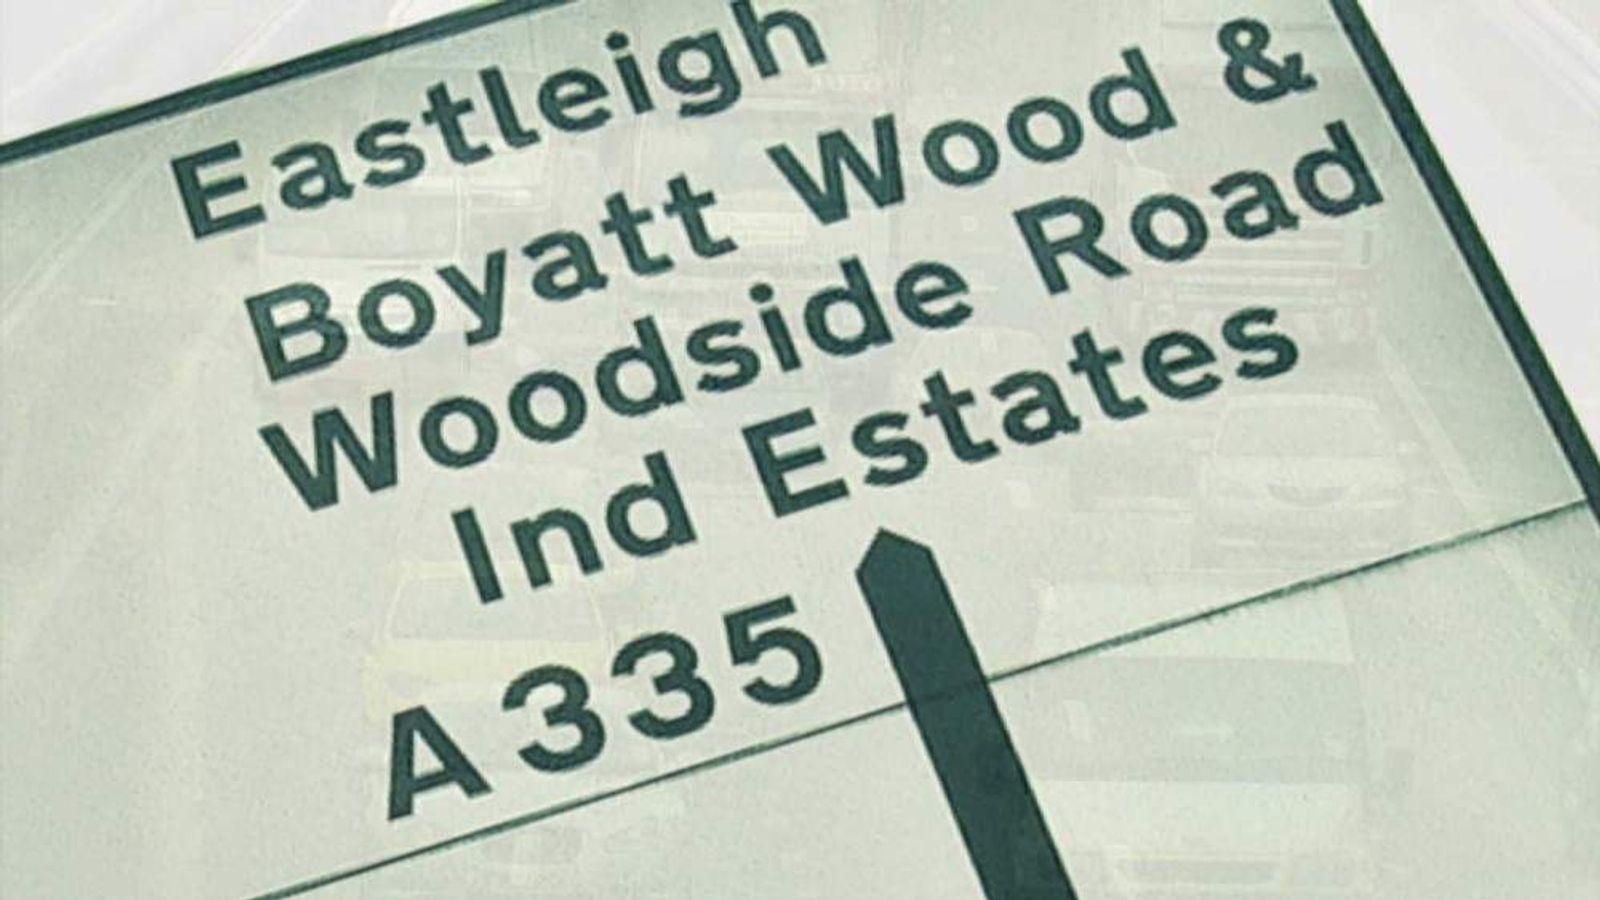 Eastleigh sign